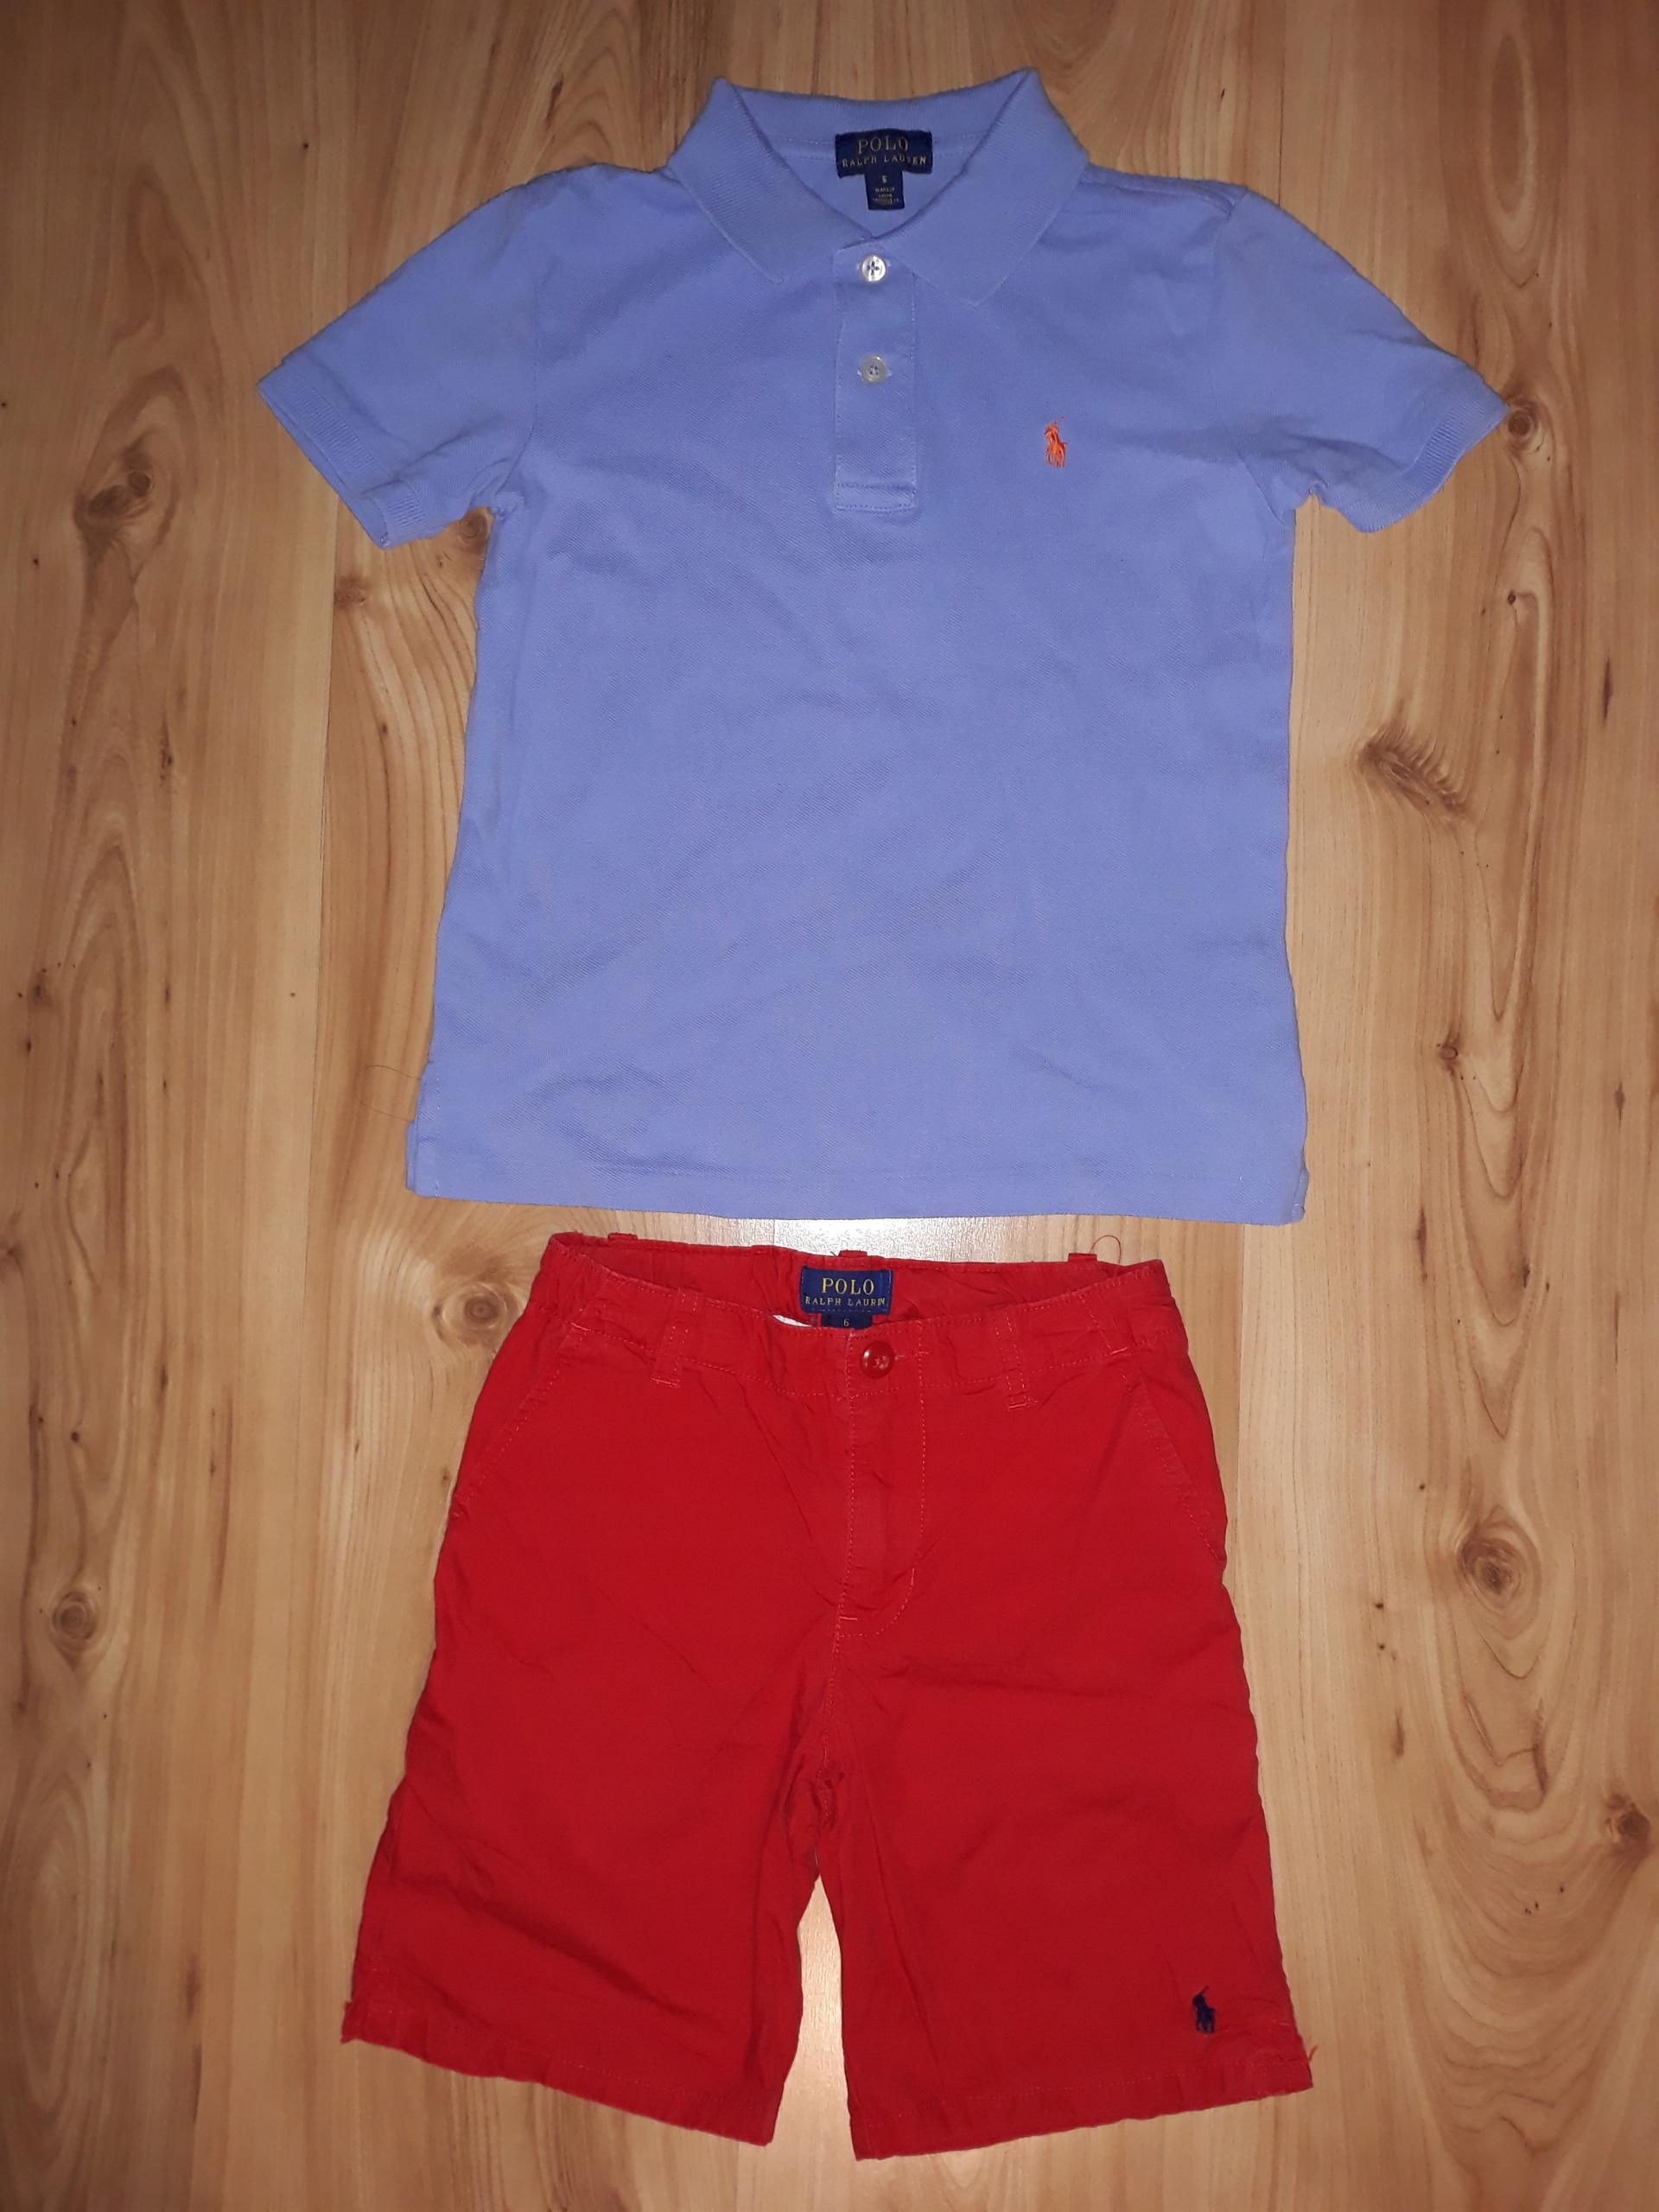 Zestaw Polo Ralph Lauren S 5-6 koszulka spodenki